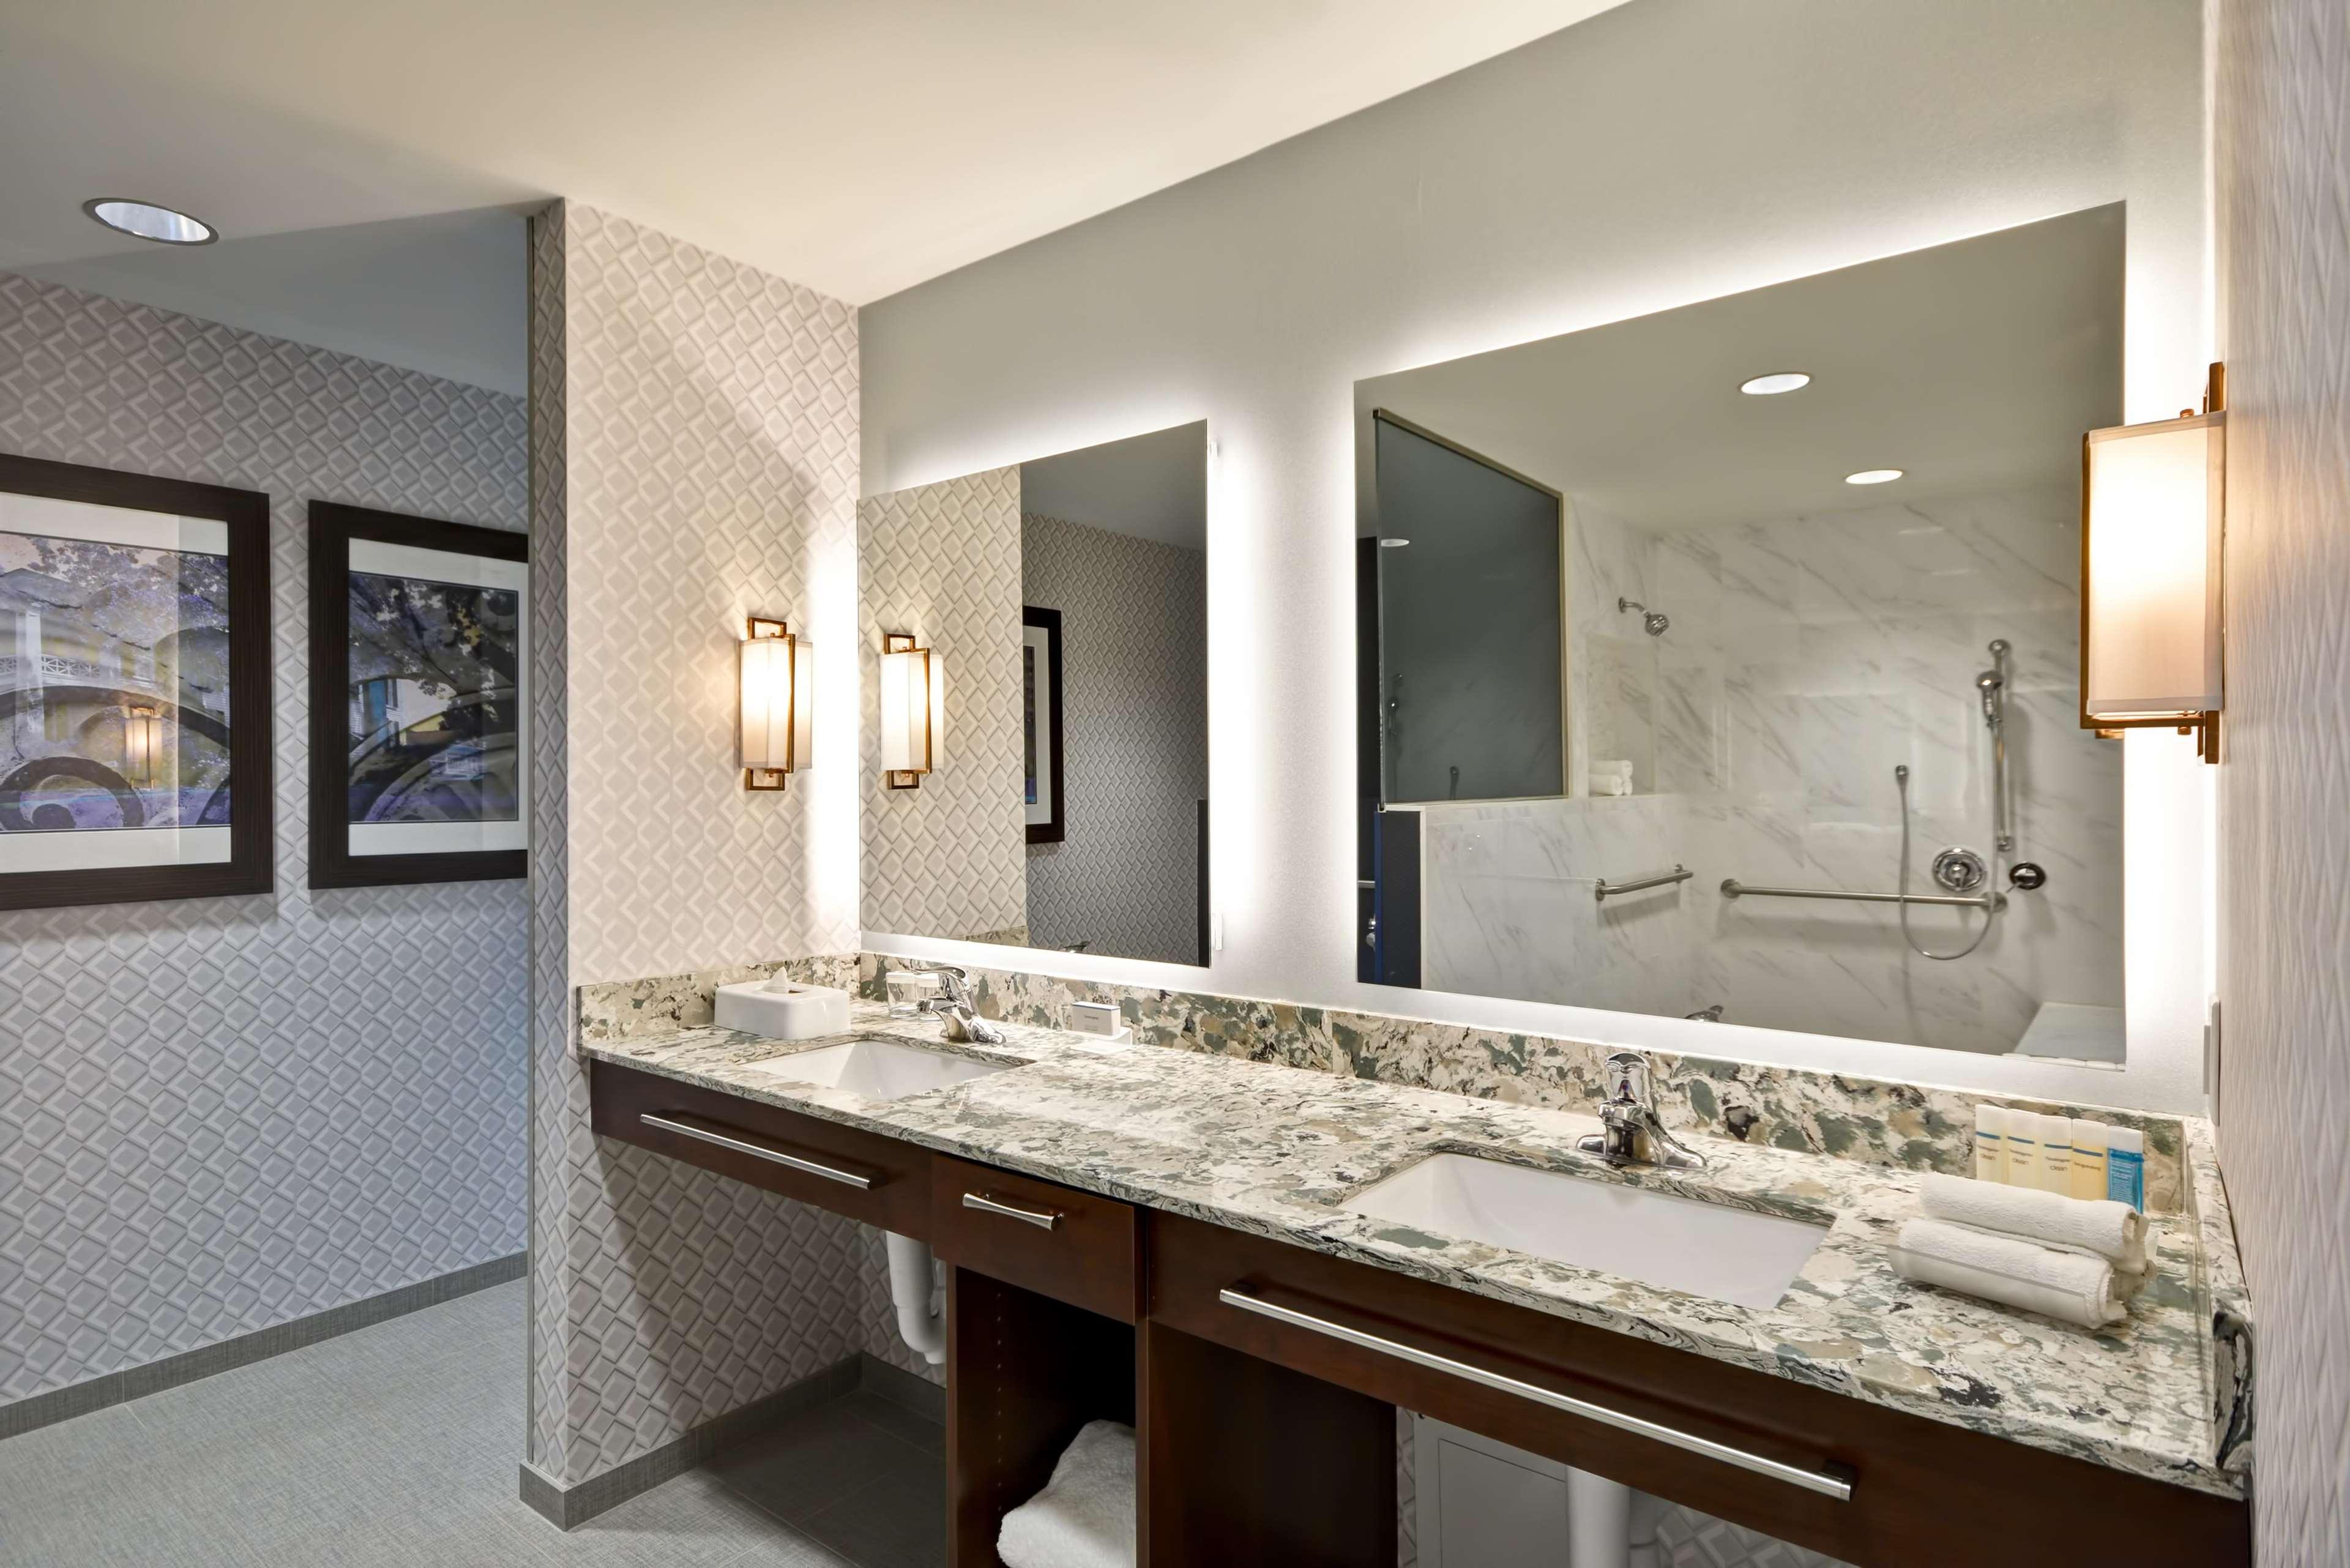 Homewood Suites by Hilton Birmingham Downtown Near UAB image 1